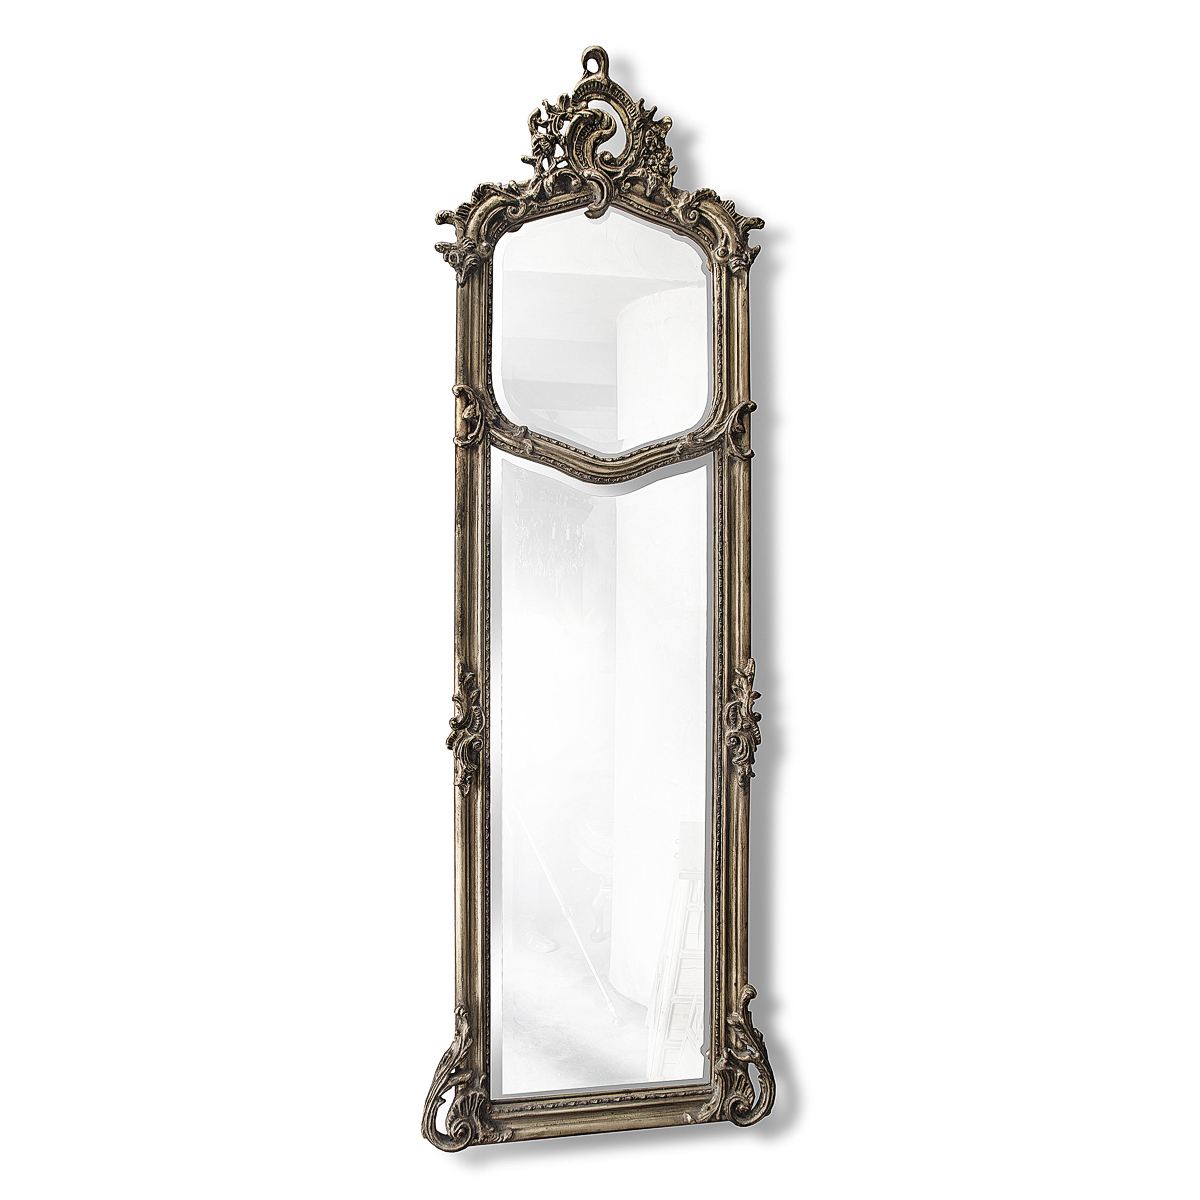 Зеркала Зеркало настенное Roomers Трумо zerkalo-nastennoe-trumo-ot-roomers-niderlandy.jpg